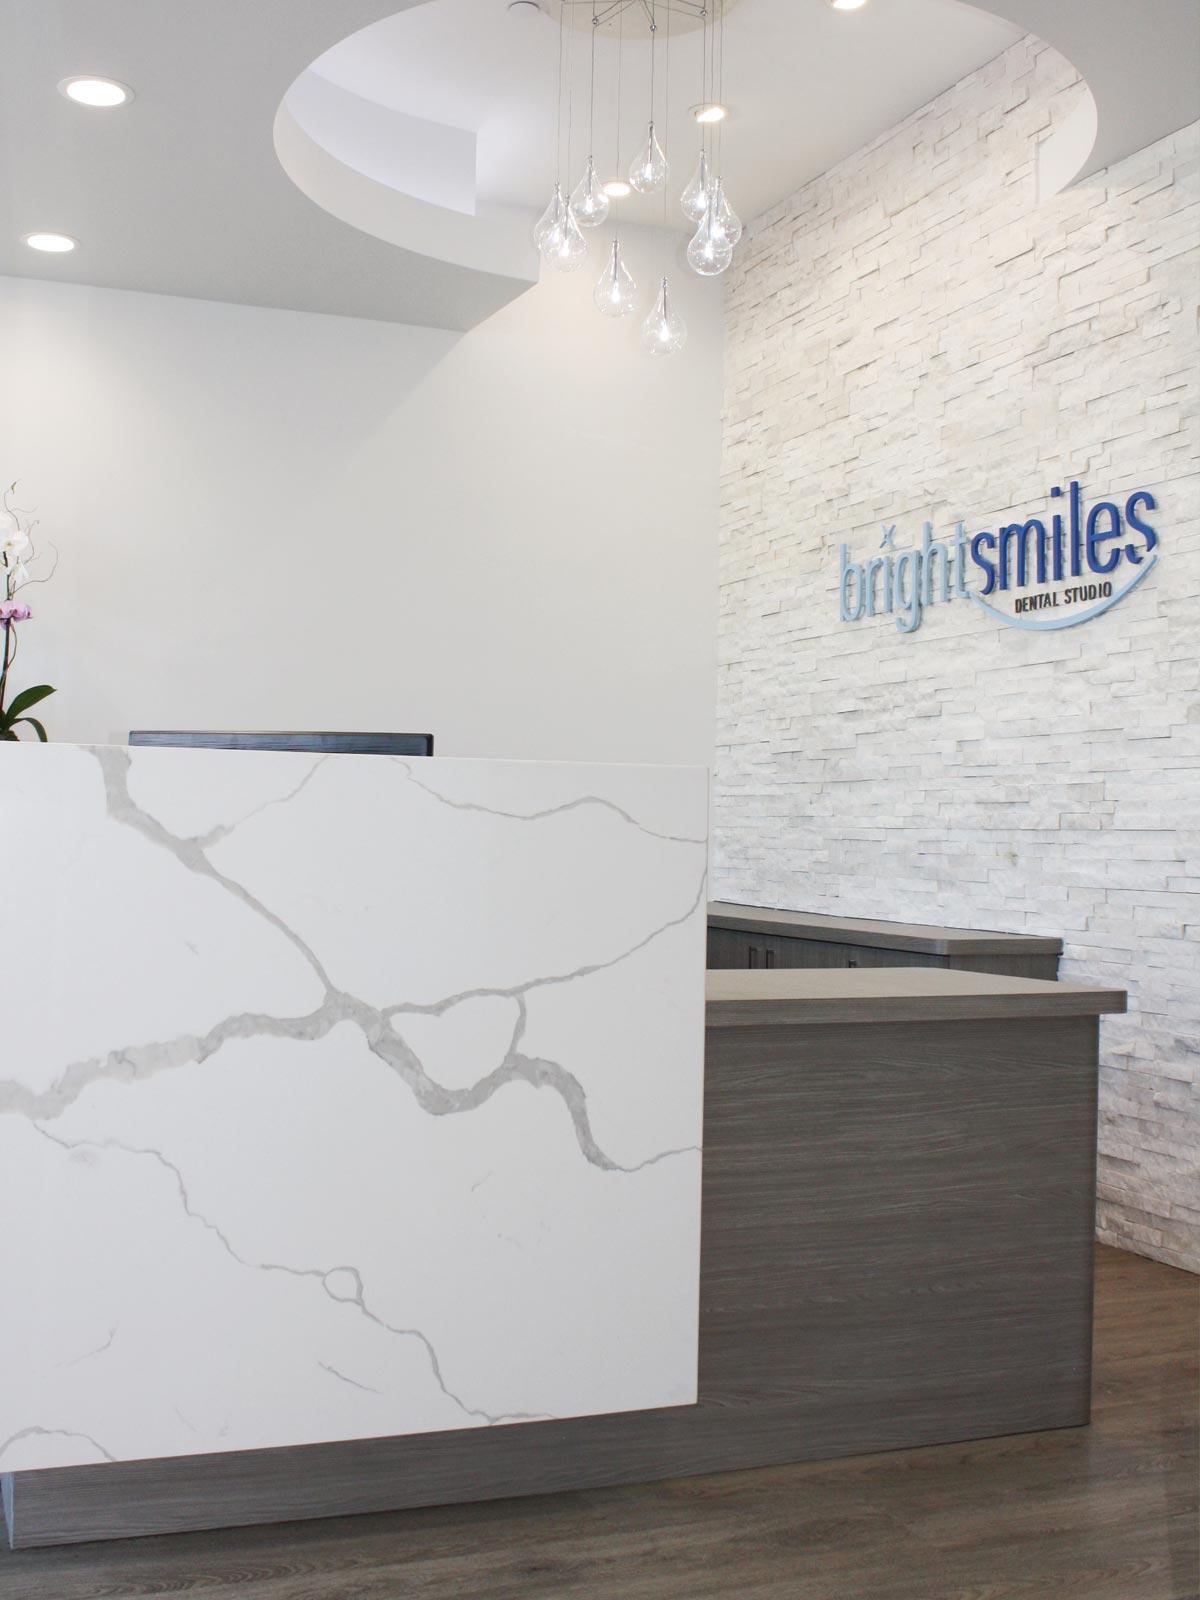 Bright Smiles dental studio 13